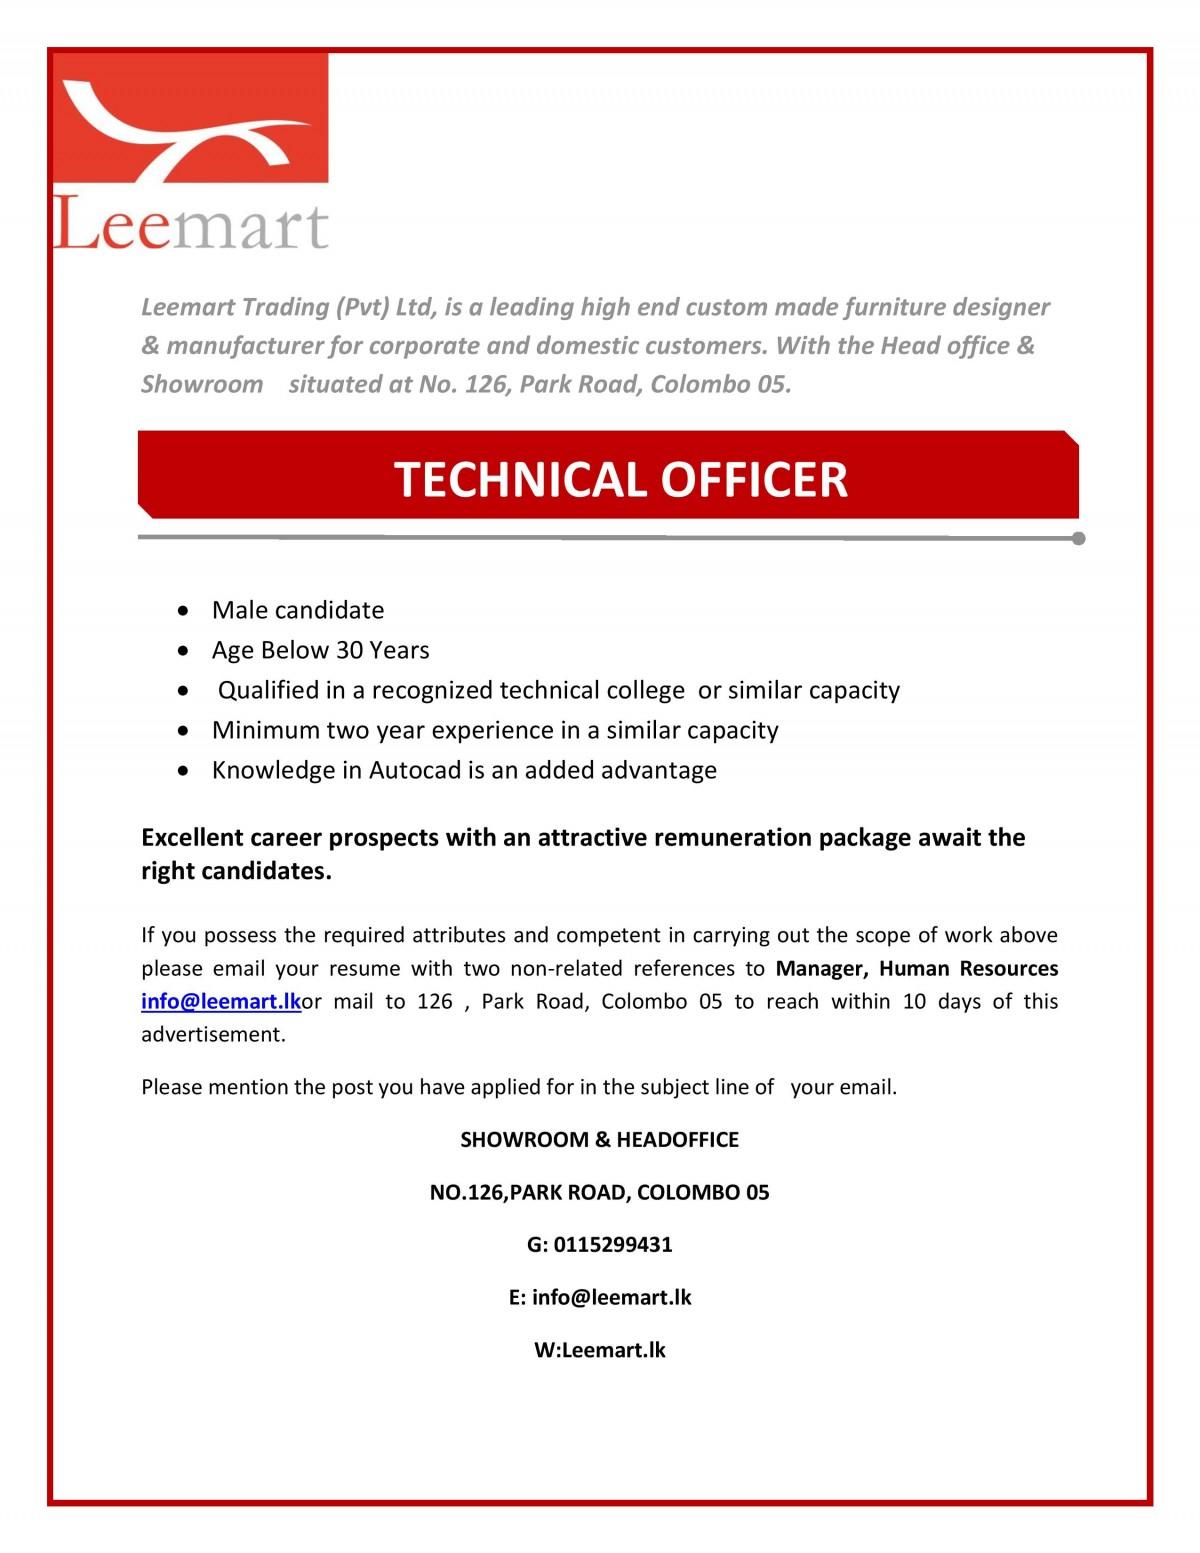 Technical Officer Job Vacancy in Sri Lanka